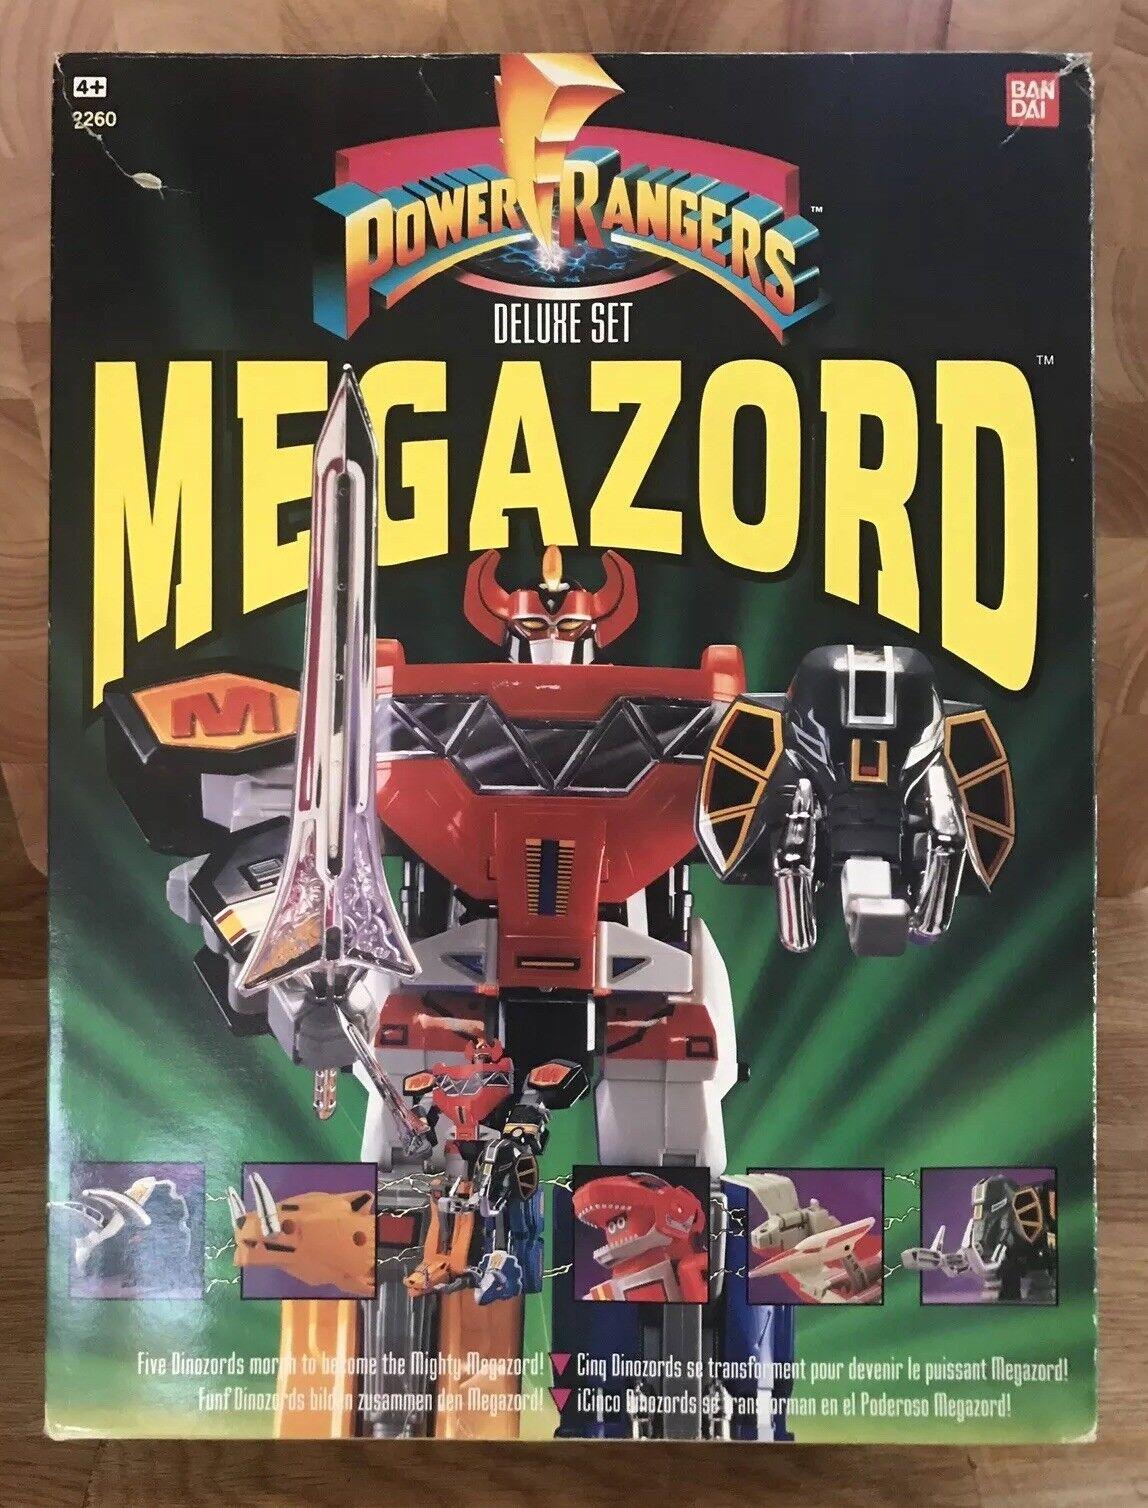 POWER RANGERS Vintage Megazord Dinozords Deluxe Set Complete Boxed Bandai 1993